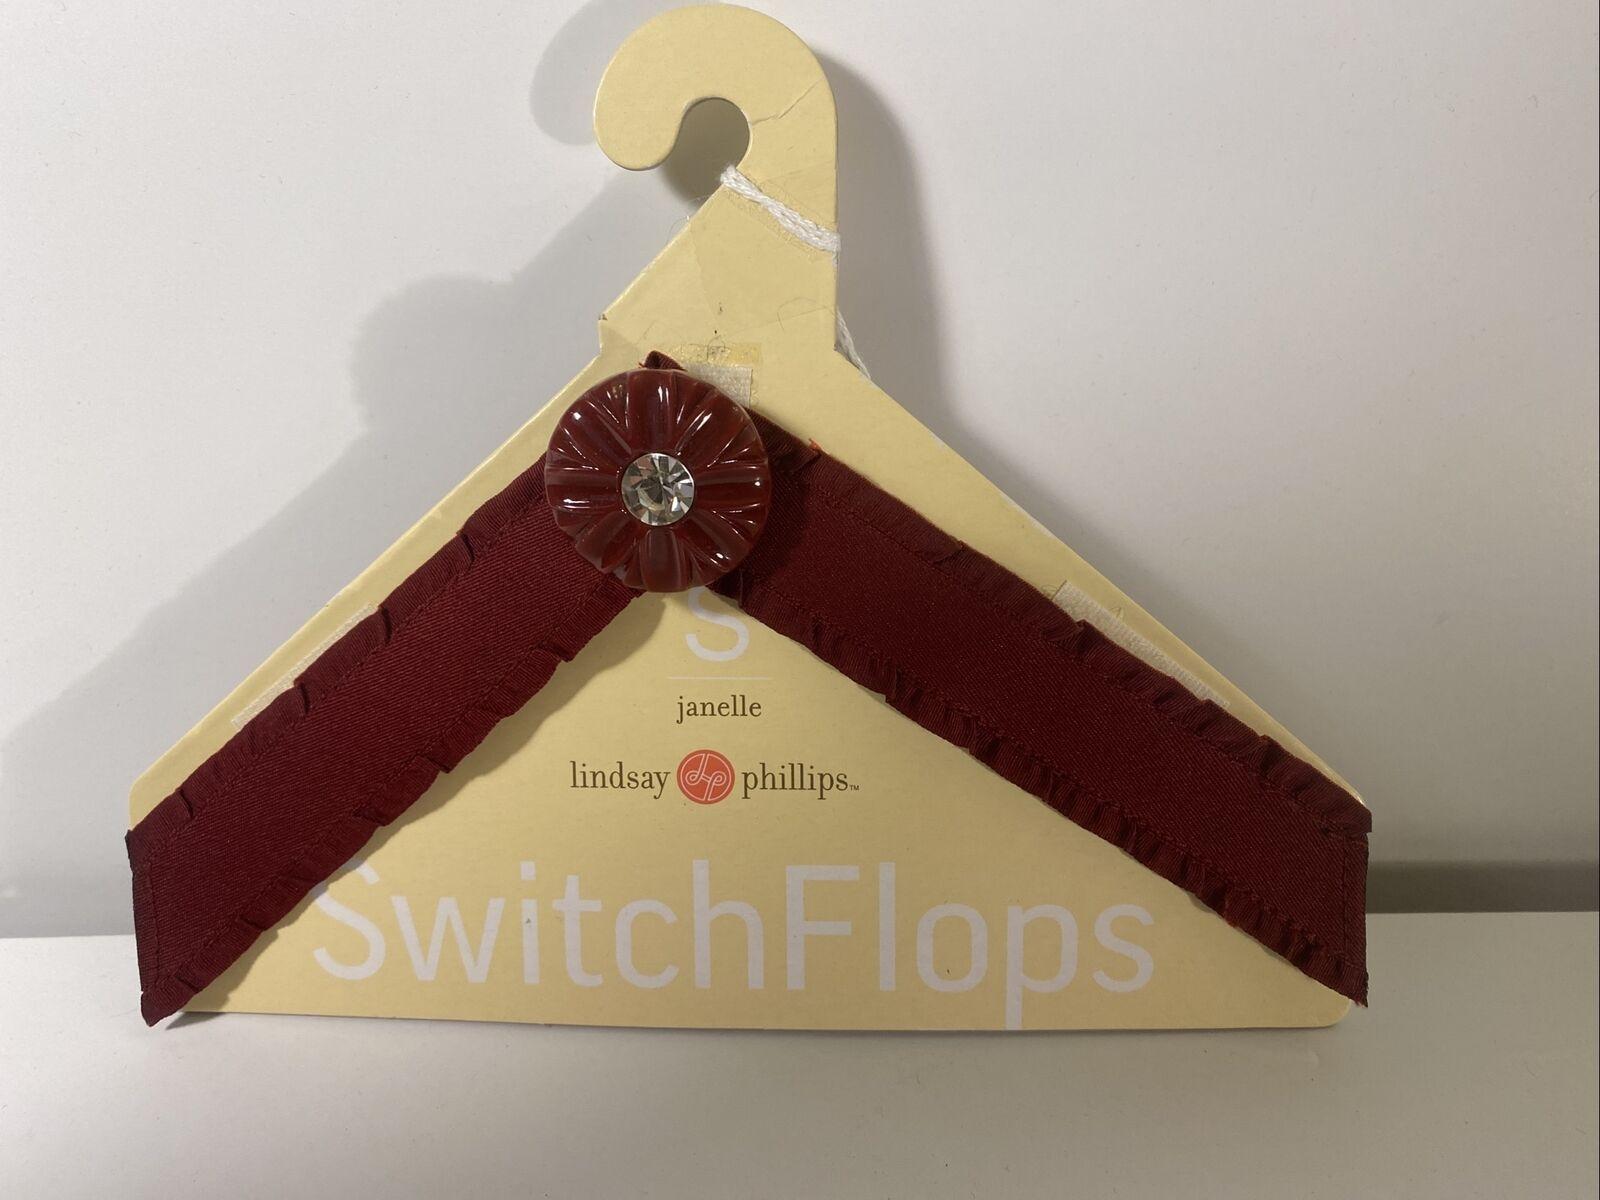 "NEW Lindsay Phillips SwitchFlops 7-8 Medium Interchangeable Straps ""Janelle"""